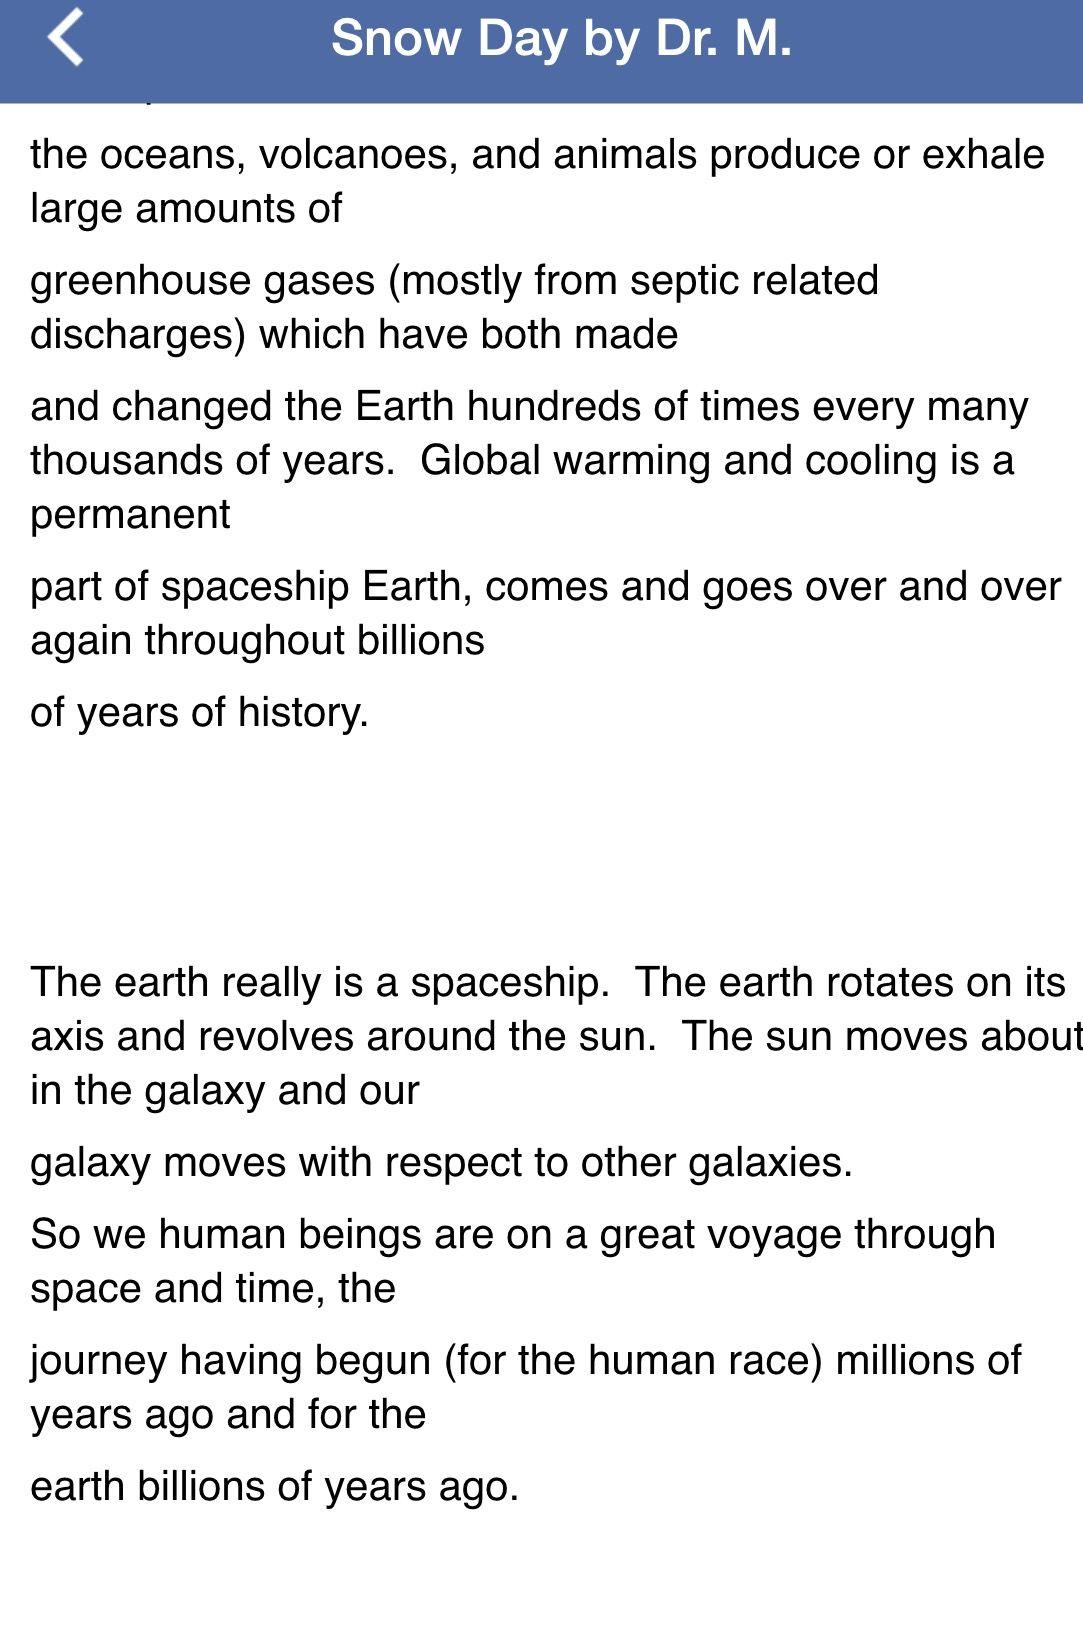 Pin By Joe Molitoris On Columns Greenhouse Gases Global Warming Spaceship Earth